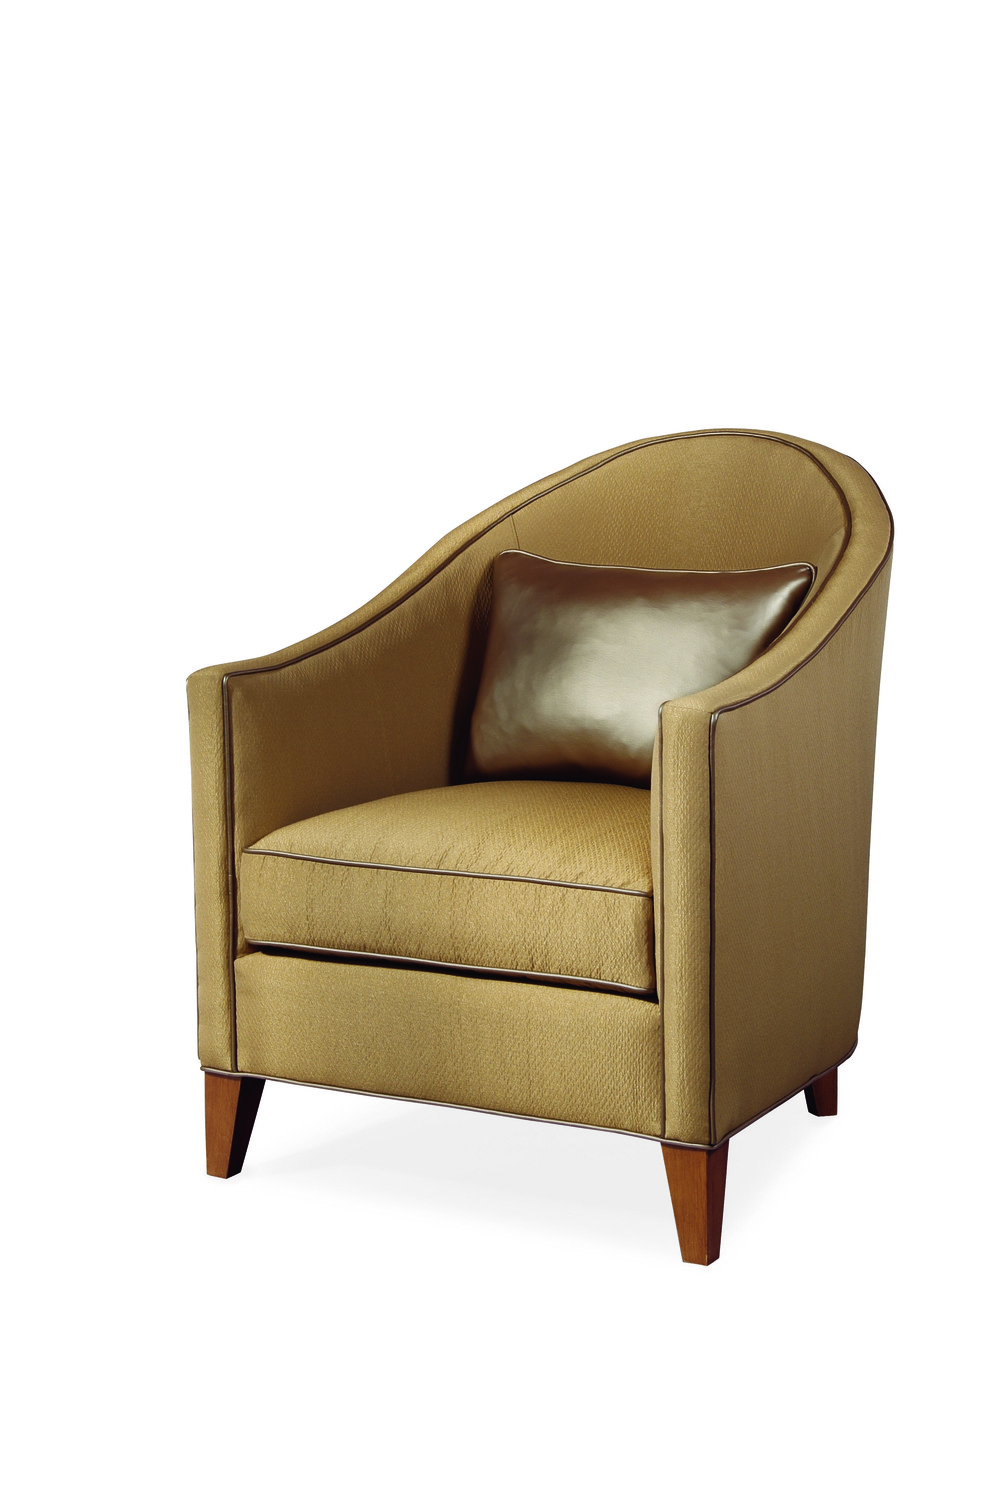 Century Furniture - Nikos Chair